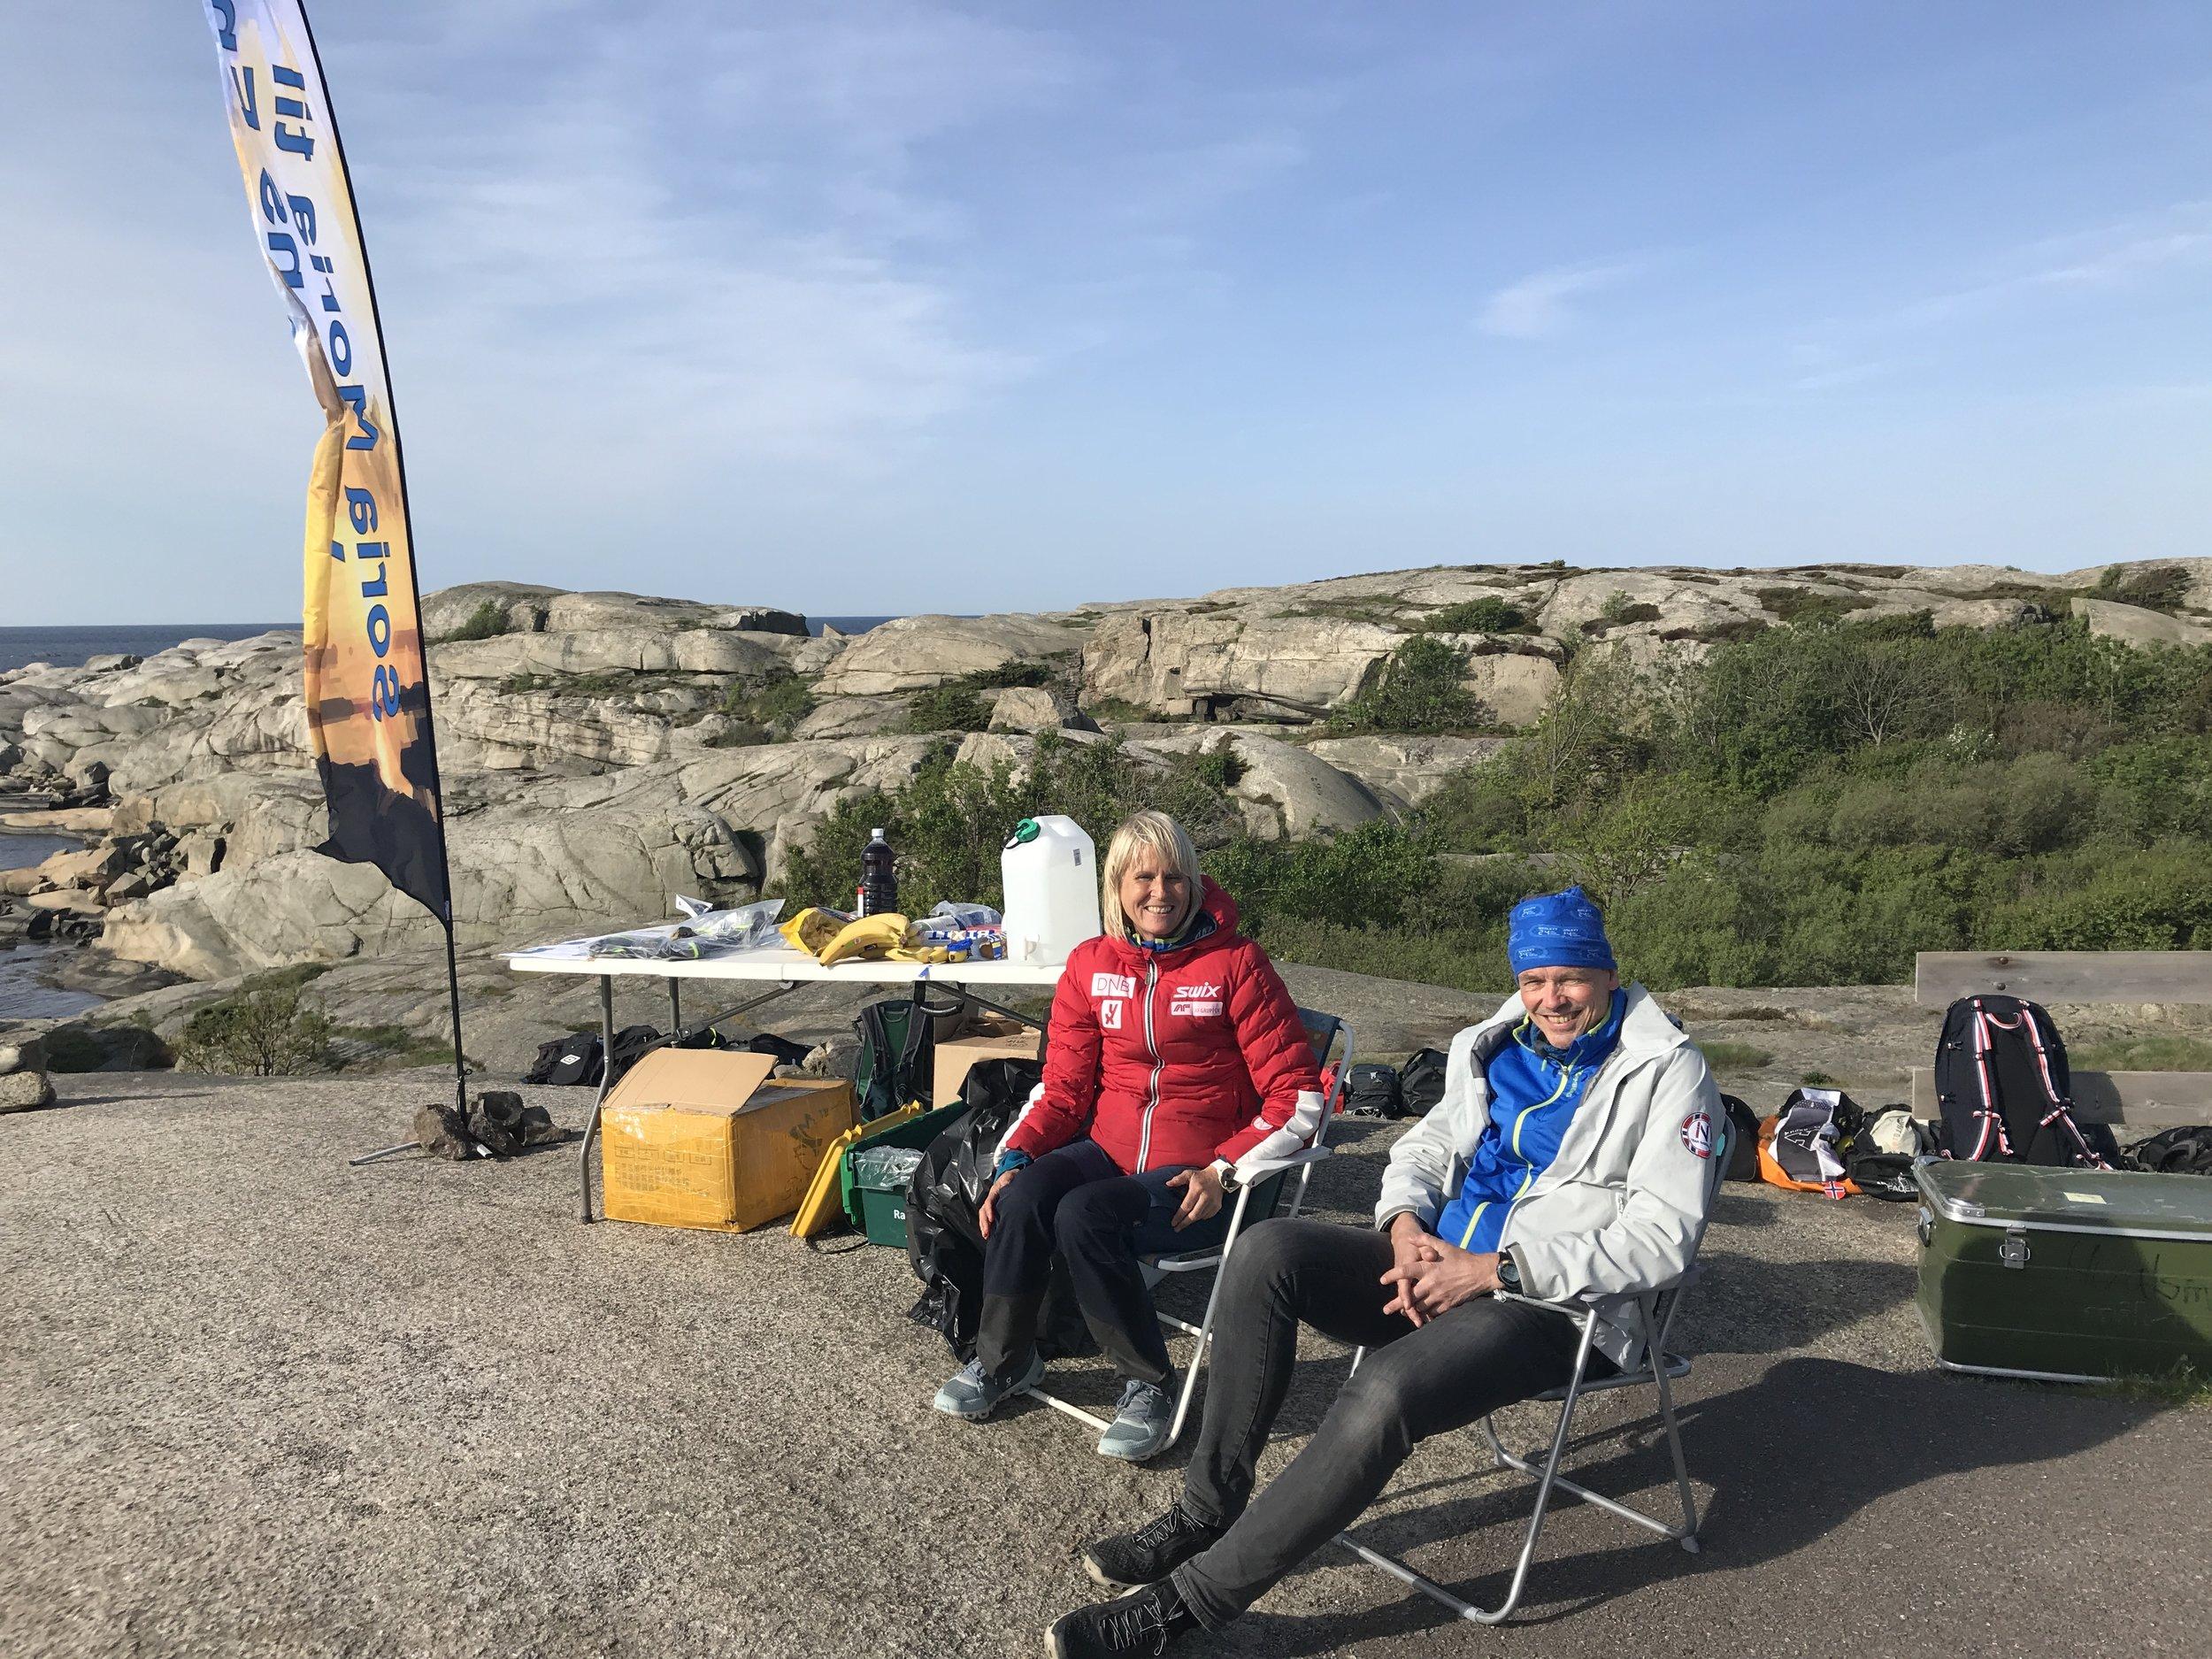 Foto: Rannveig Oseberg  Mona og Einar har godt grep om Langt og Lenges ultraløp, både Soria Moria til Verdens Ende og Blefjell Beste kan varmt anbefales